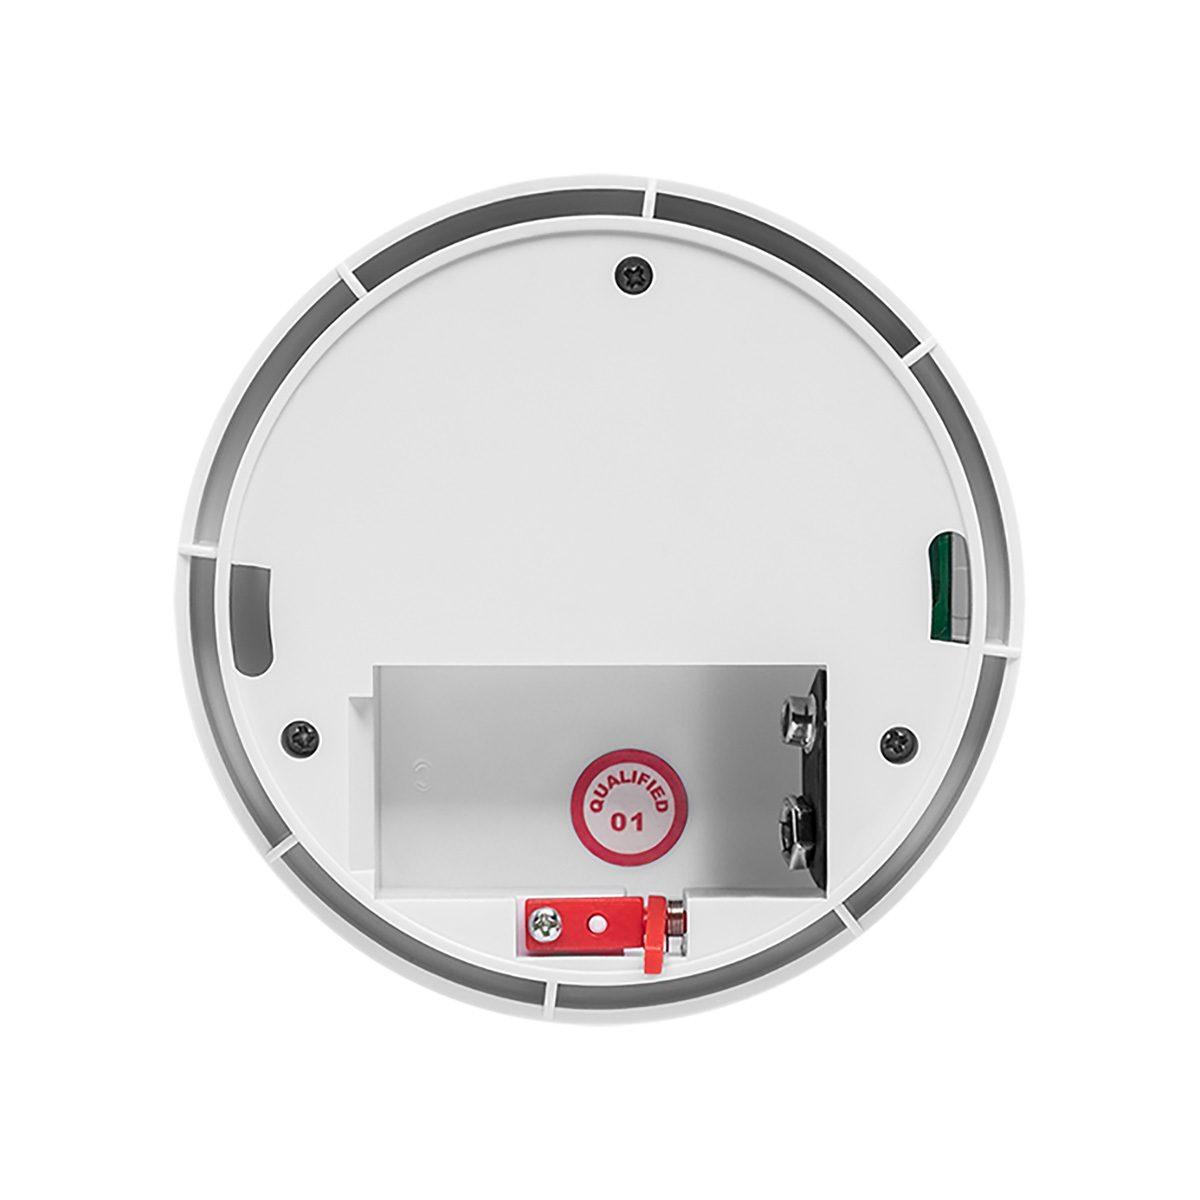 Detector de fumaça autônomo Intelbras DFA 620